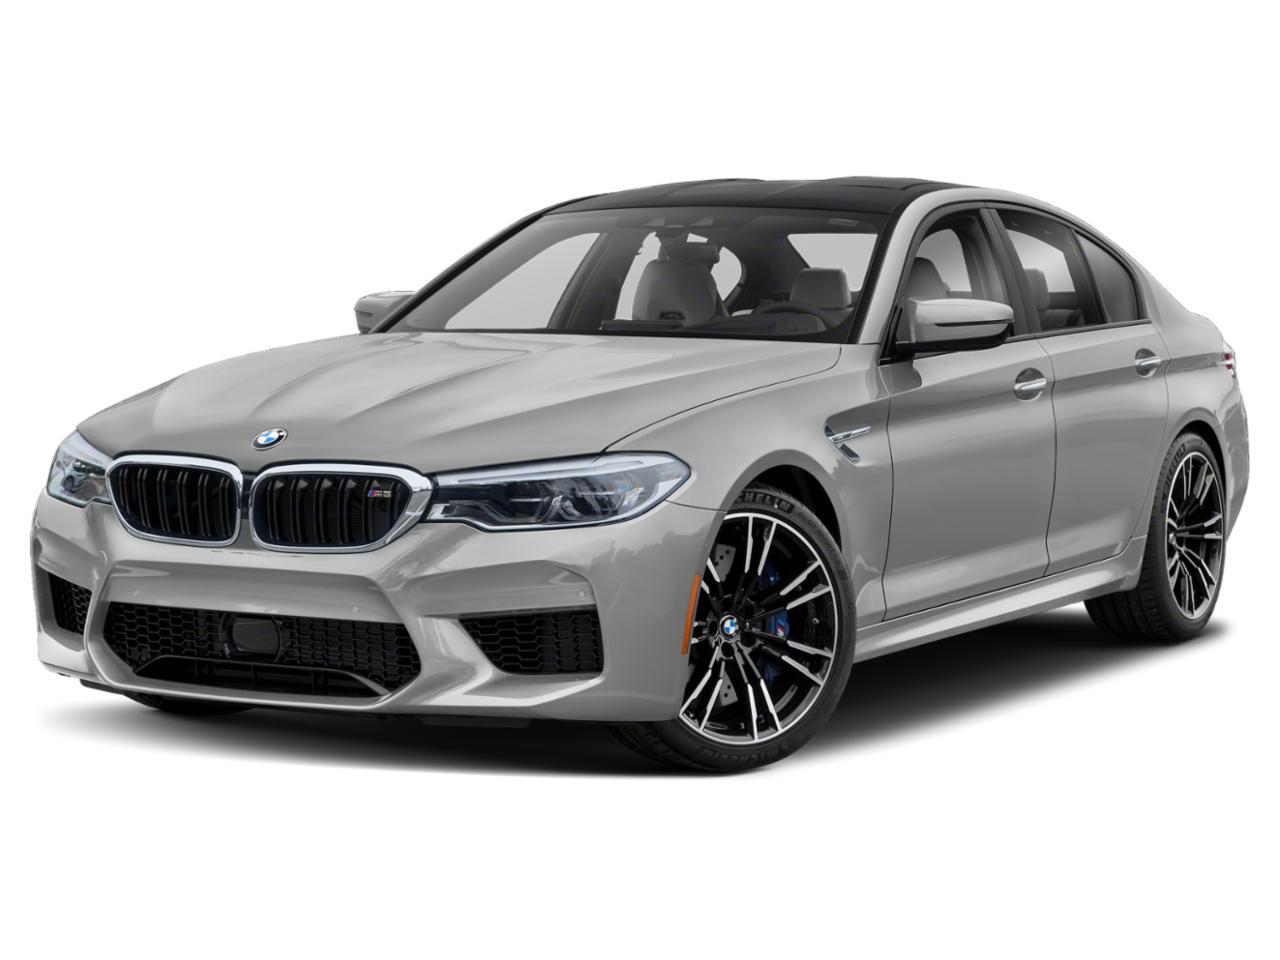 2019 BMW M5 Vehicle Photo in Pleasanton, CA 94588